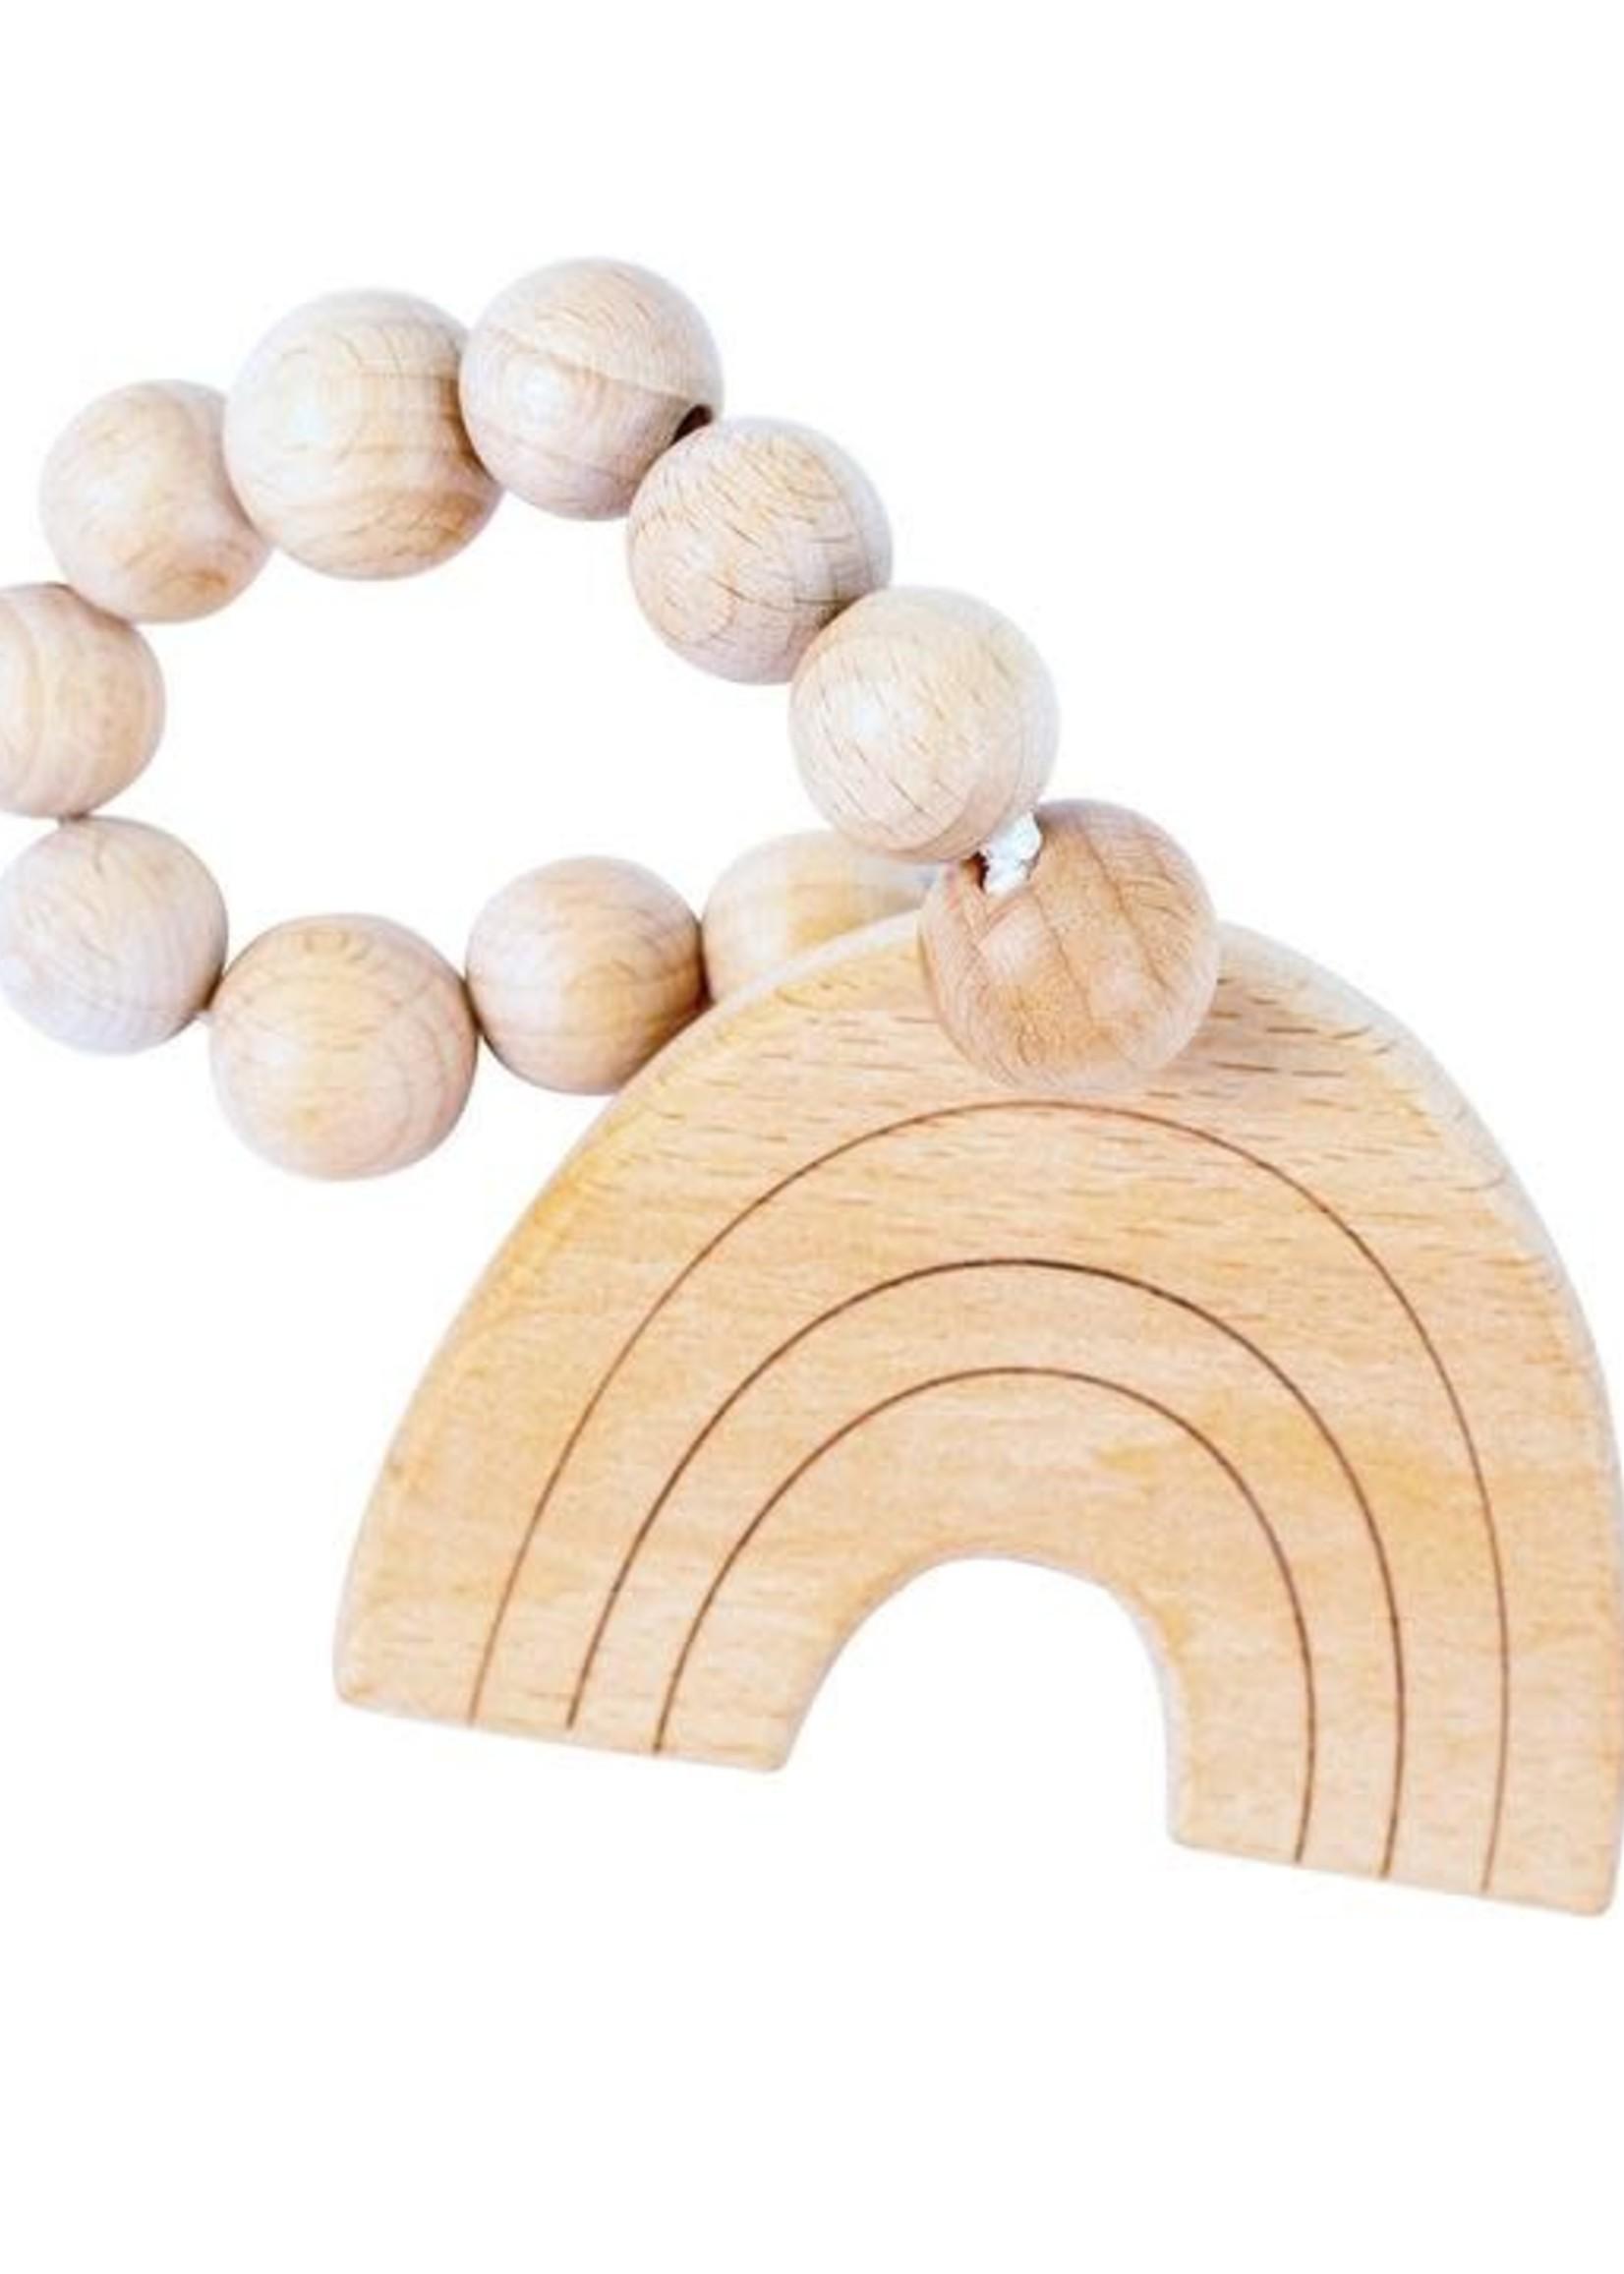 Bebe Au Lait Rainbow Natural Wooden Teether